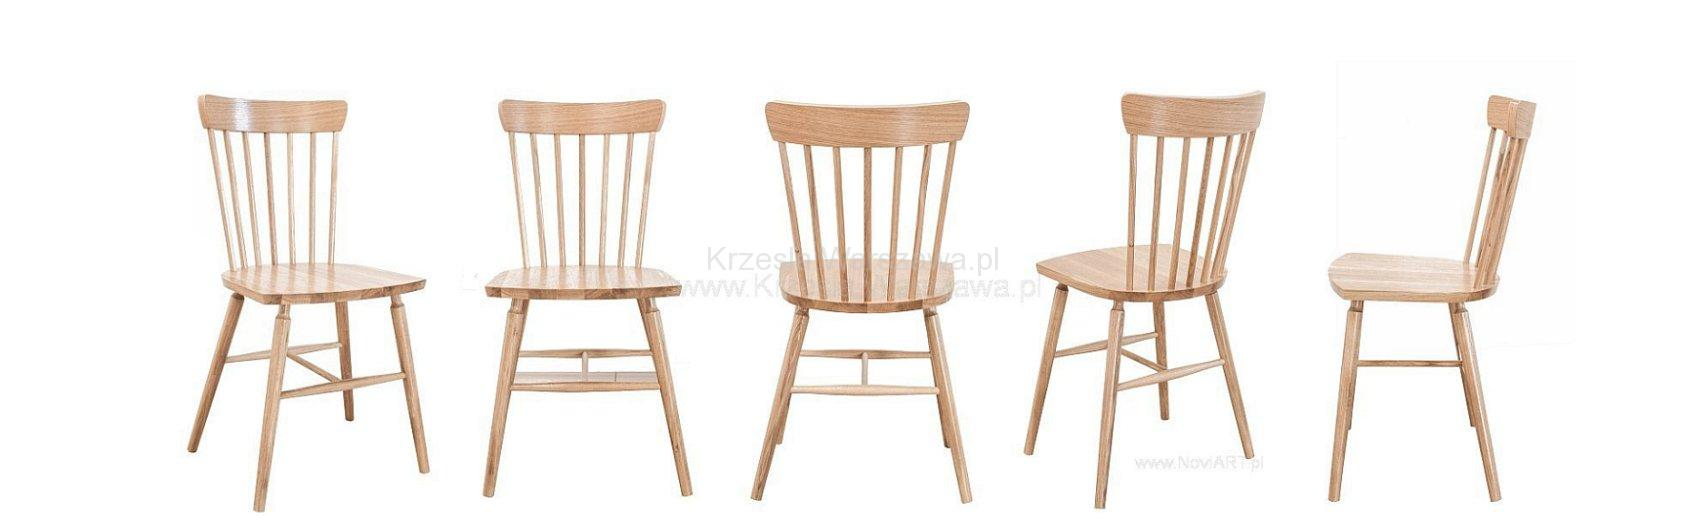 krzesla-debowe--lite-drewno